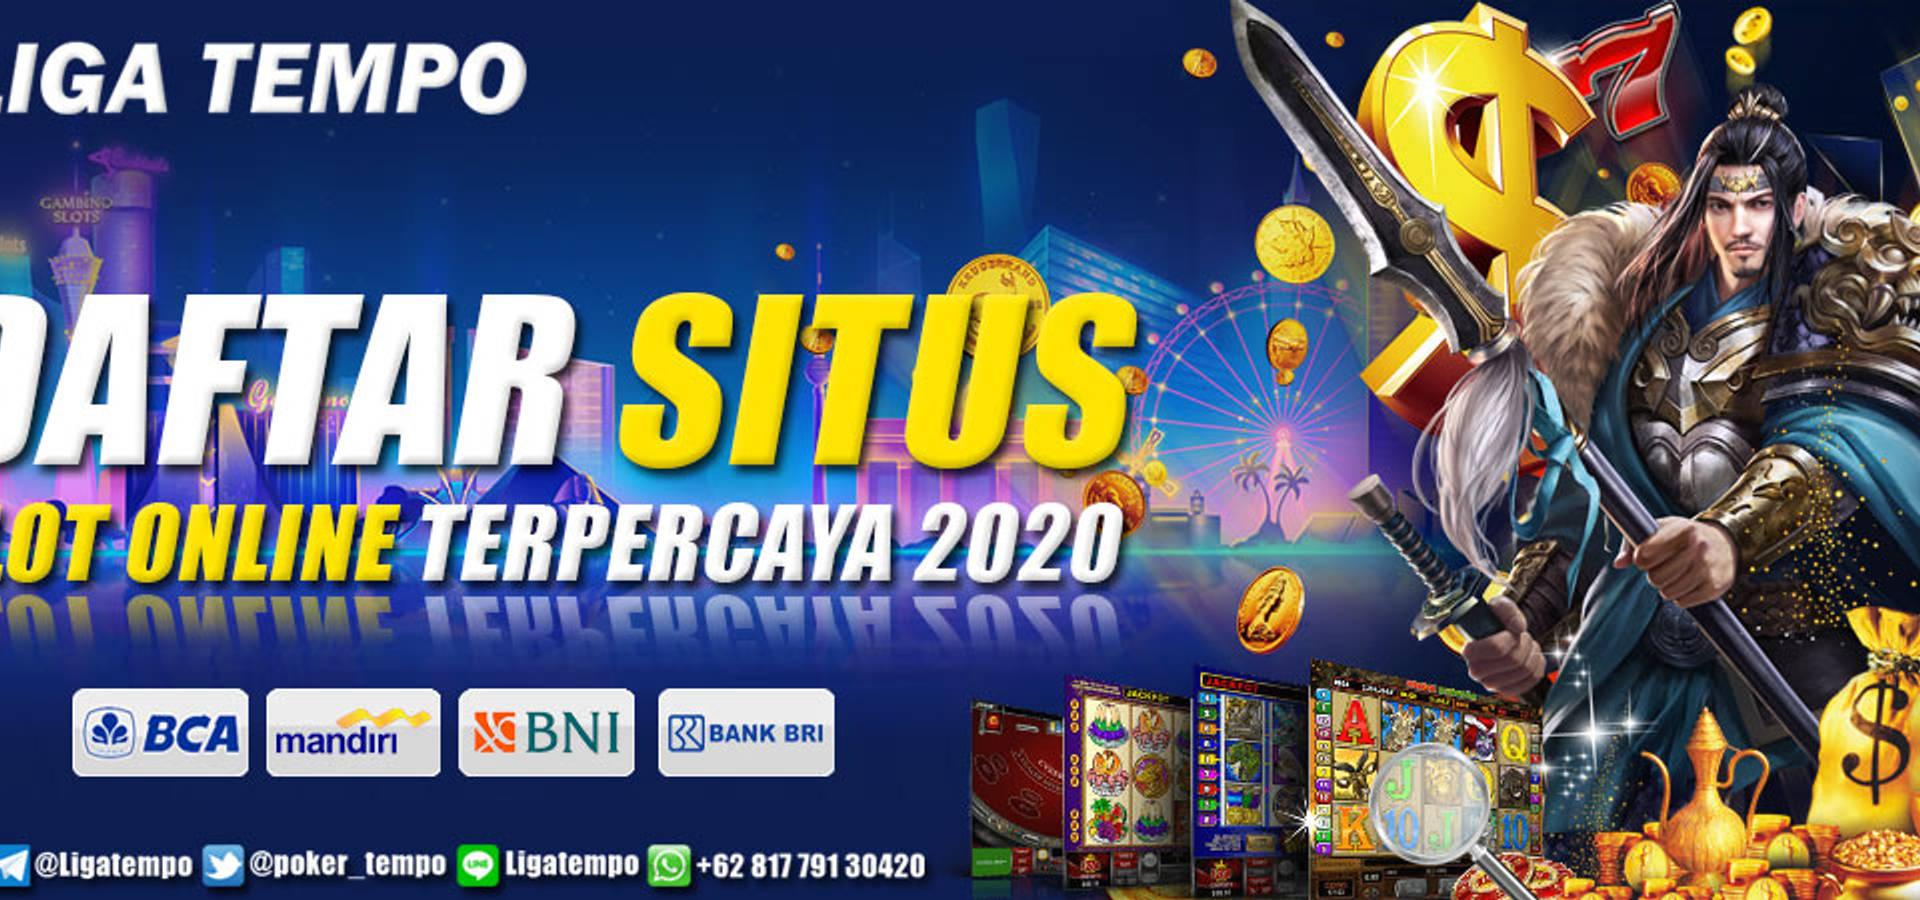 LIGATEMPO Daftar Situs Slot Online Terpercaya 2020